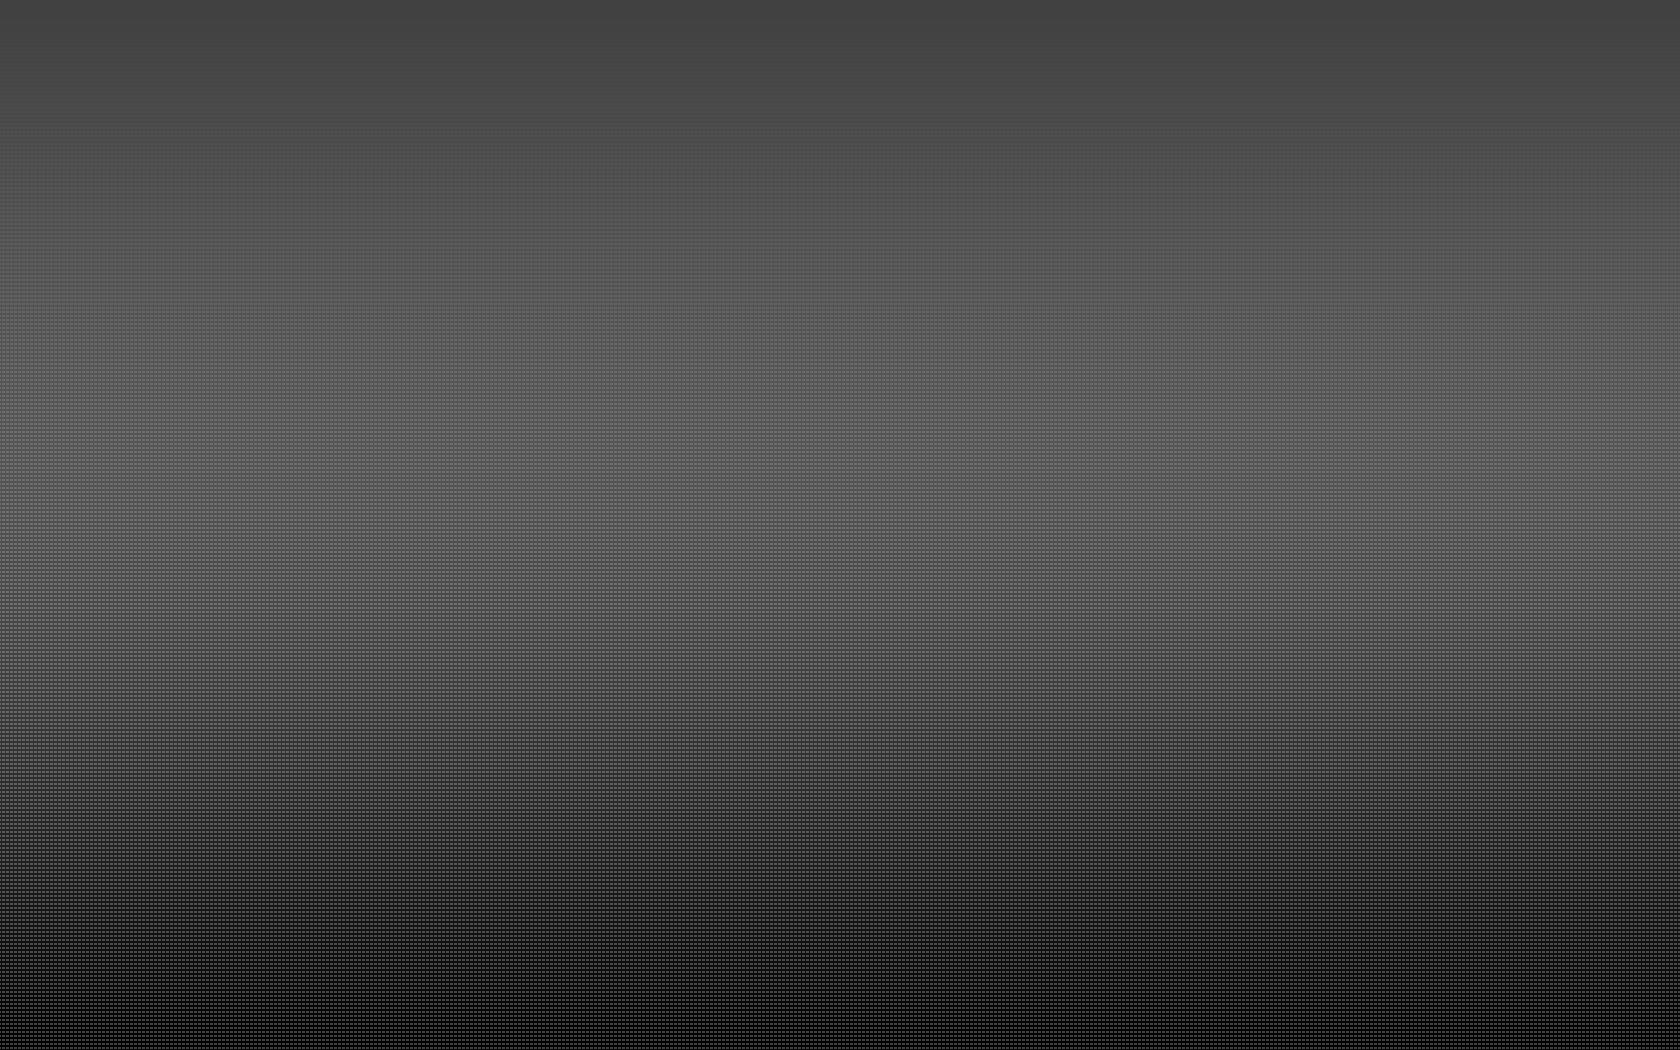 black and grey pattern by kkll70 customization wallpaper minimalistic 1680x1050